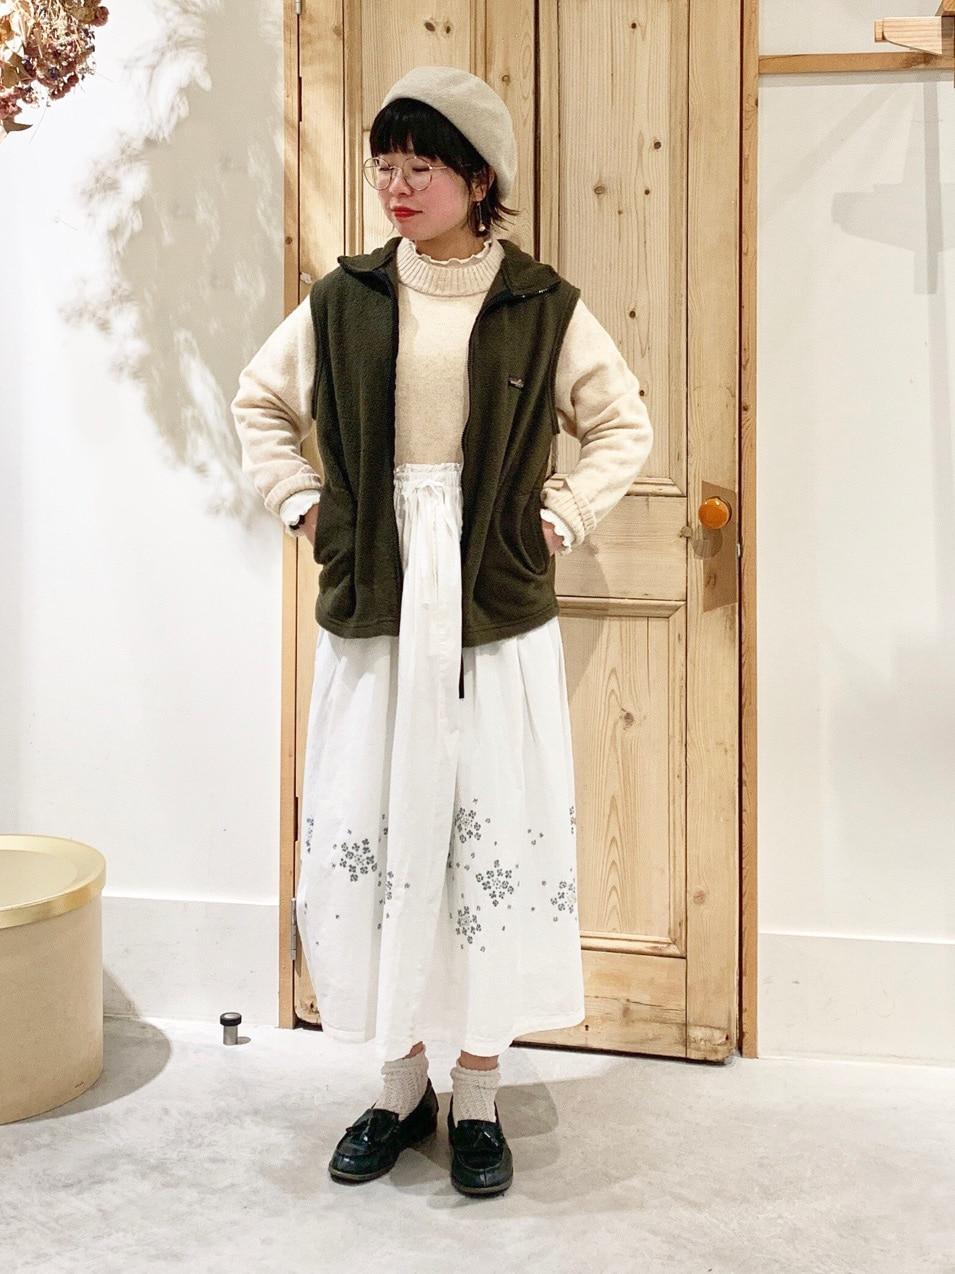 Malle chambre de charme 調布パルコ 身長:153cm 2020.12.18